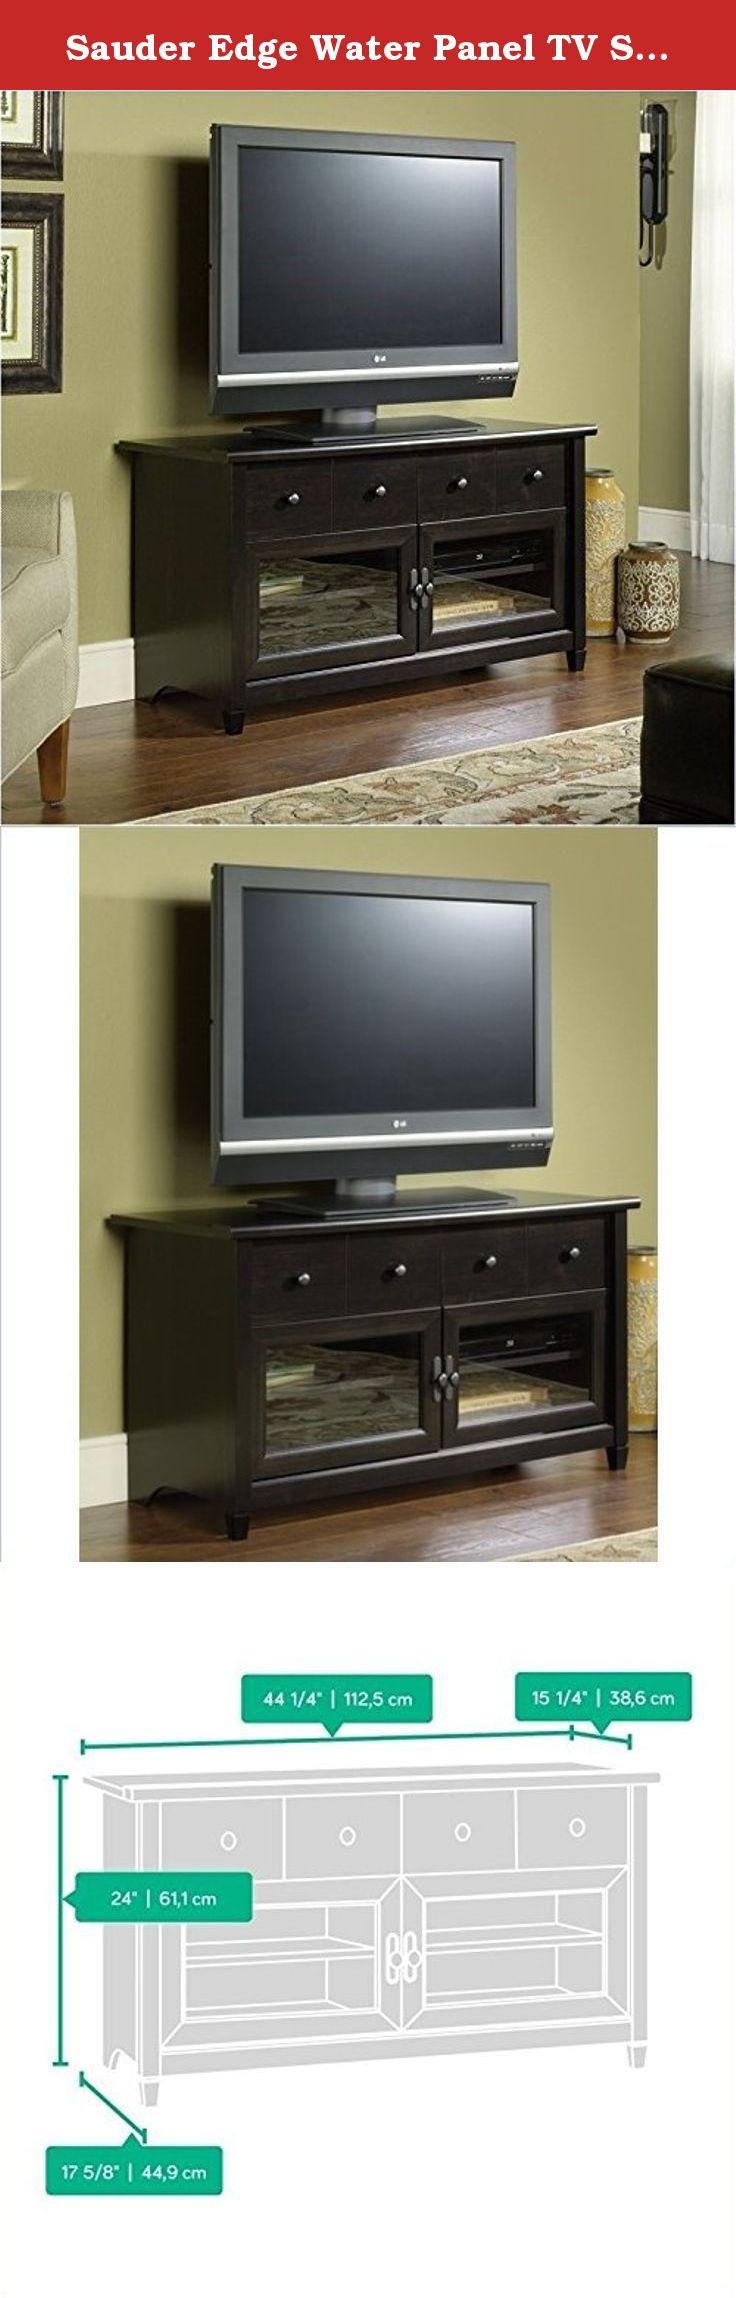 Sauder Edge Water Panel Tv Stand Estate Black Finish In Keeping